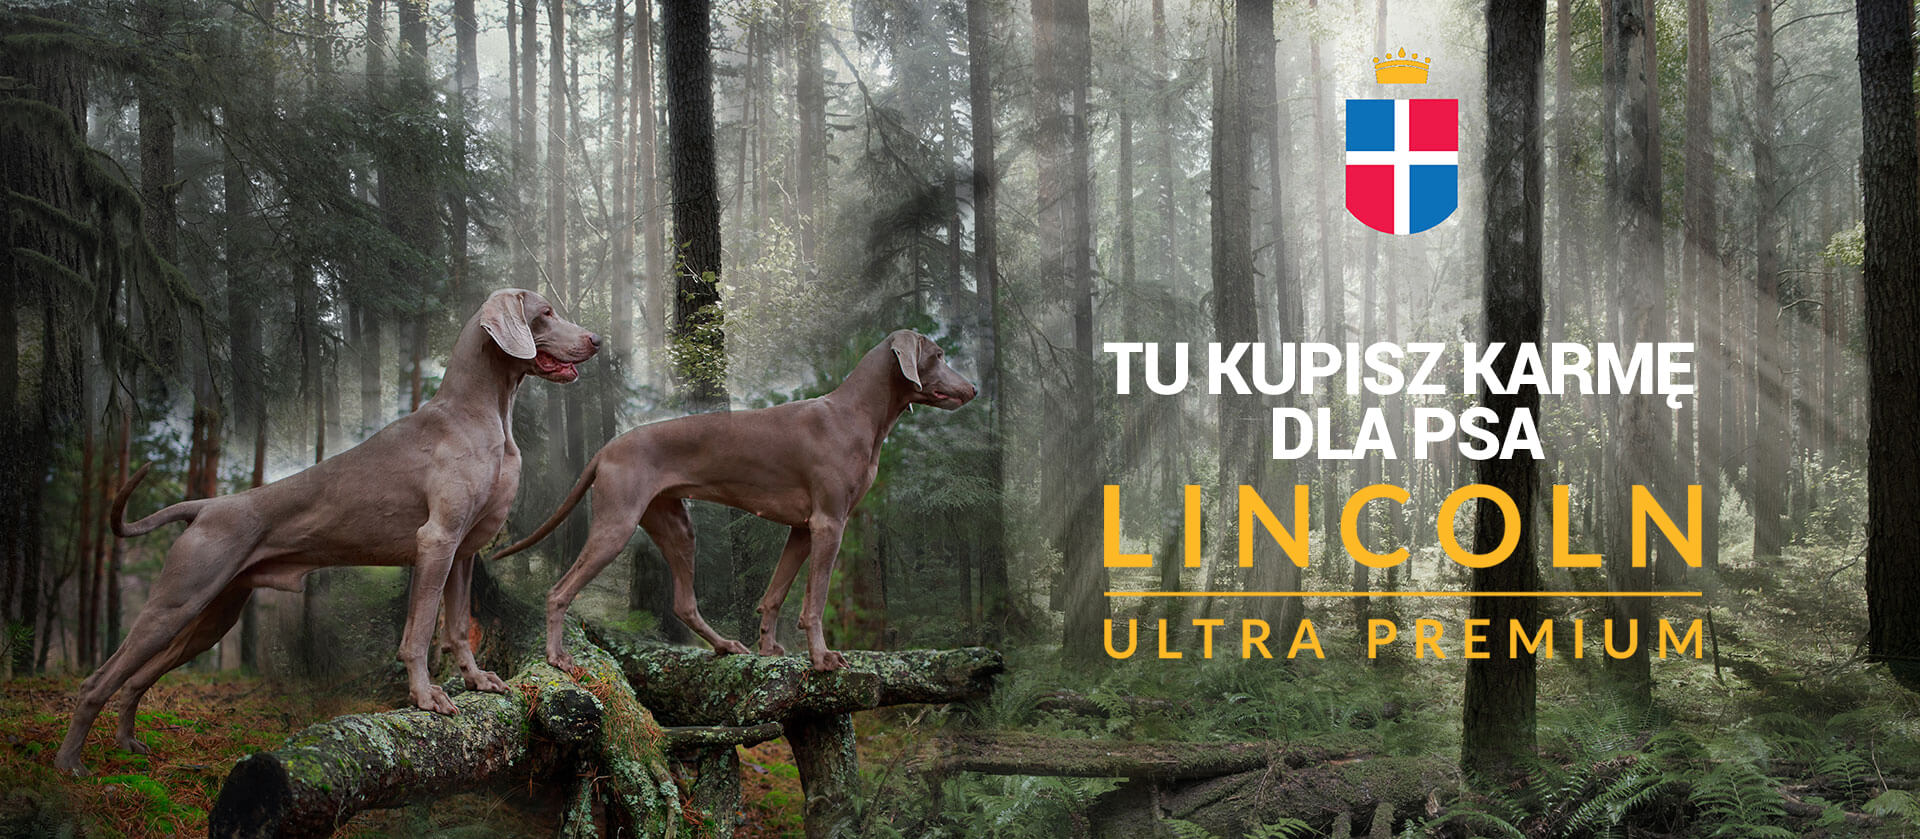 lincoln ultra premium karma dla psa alergika